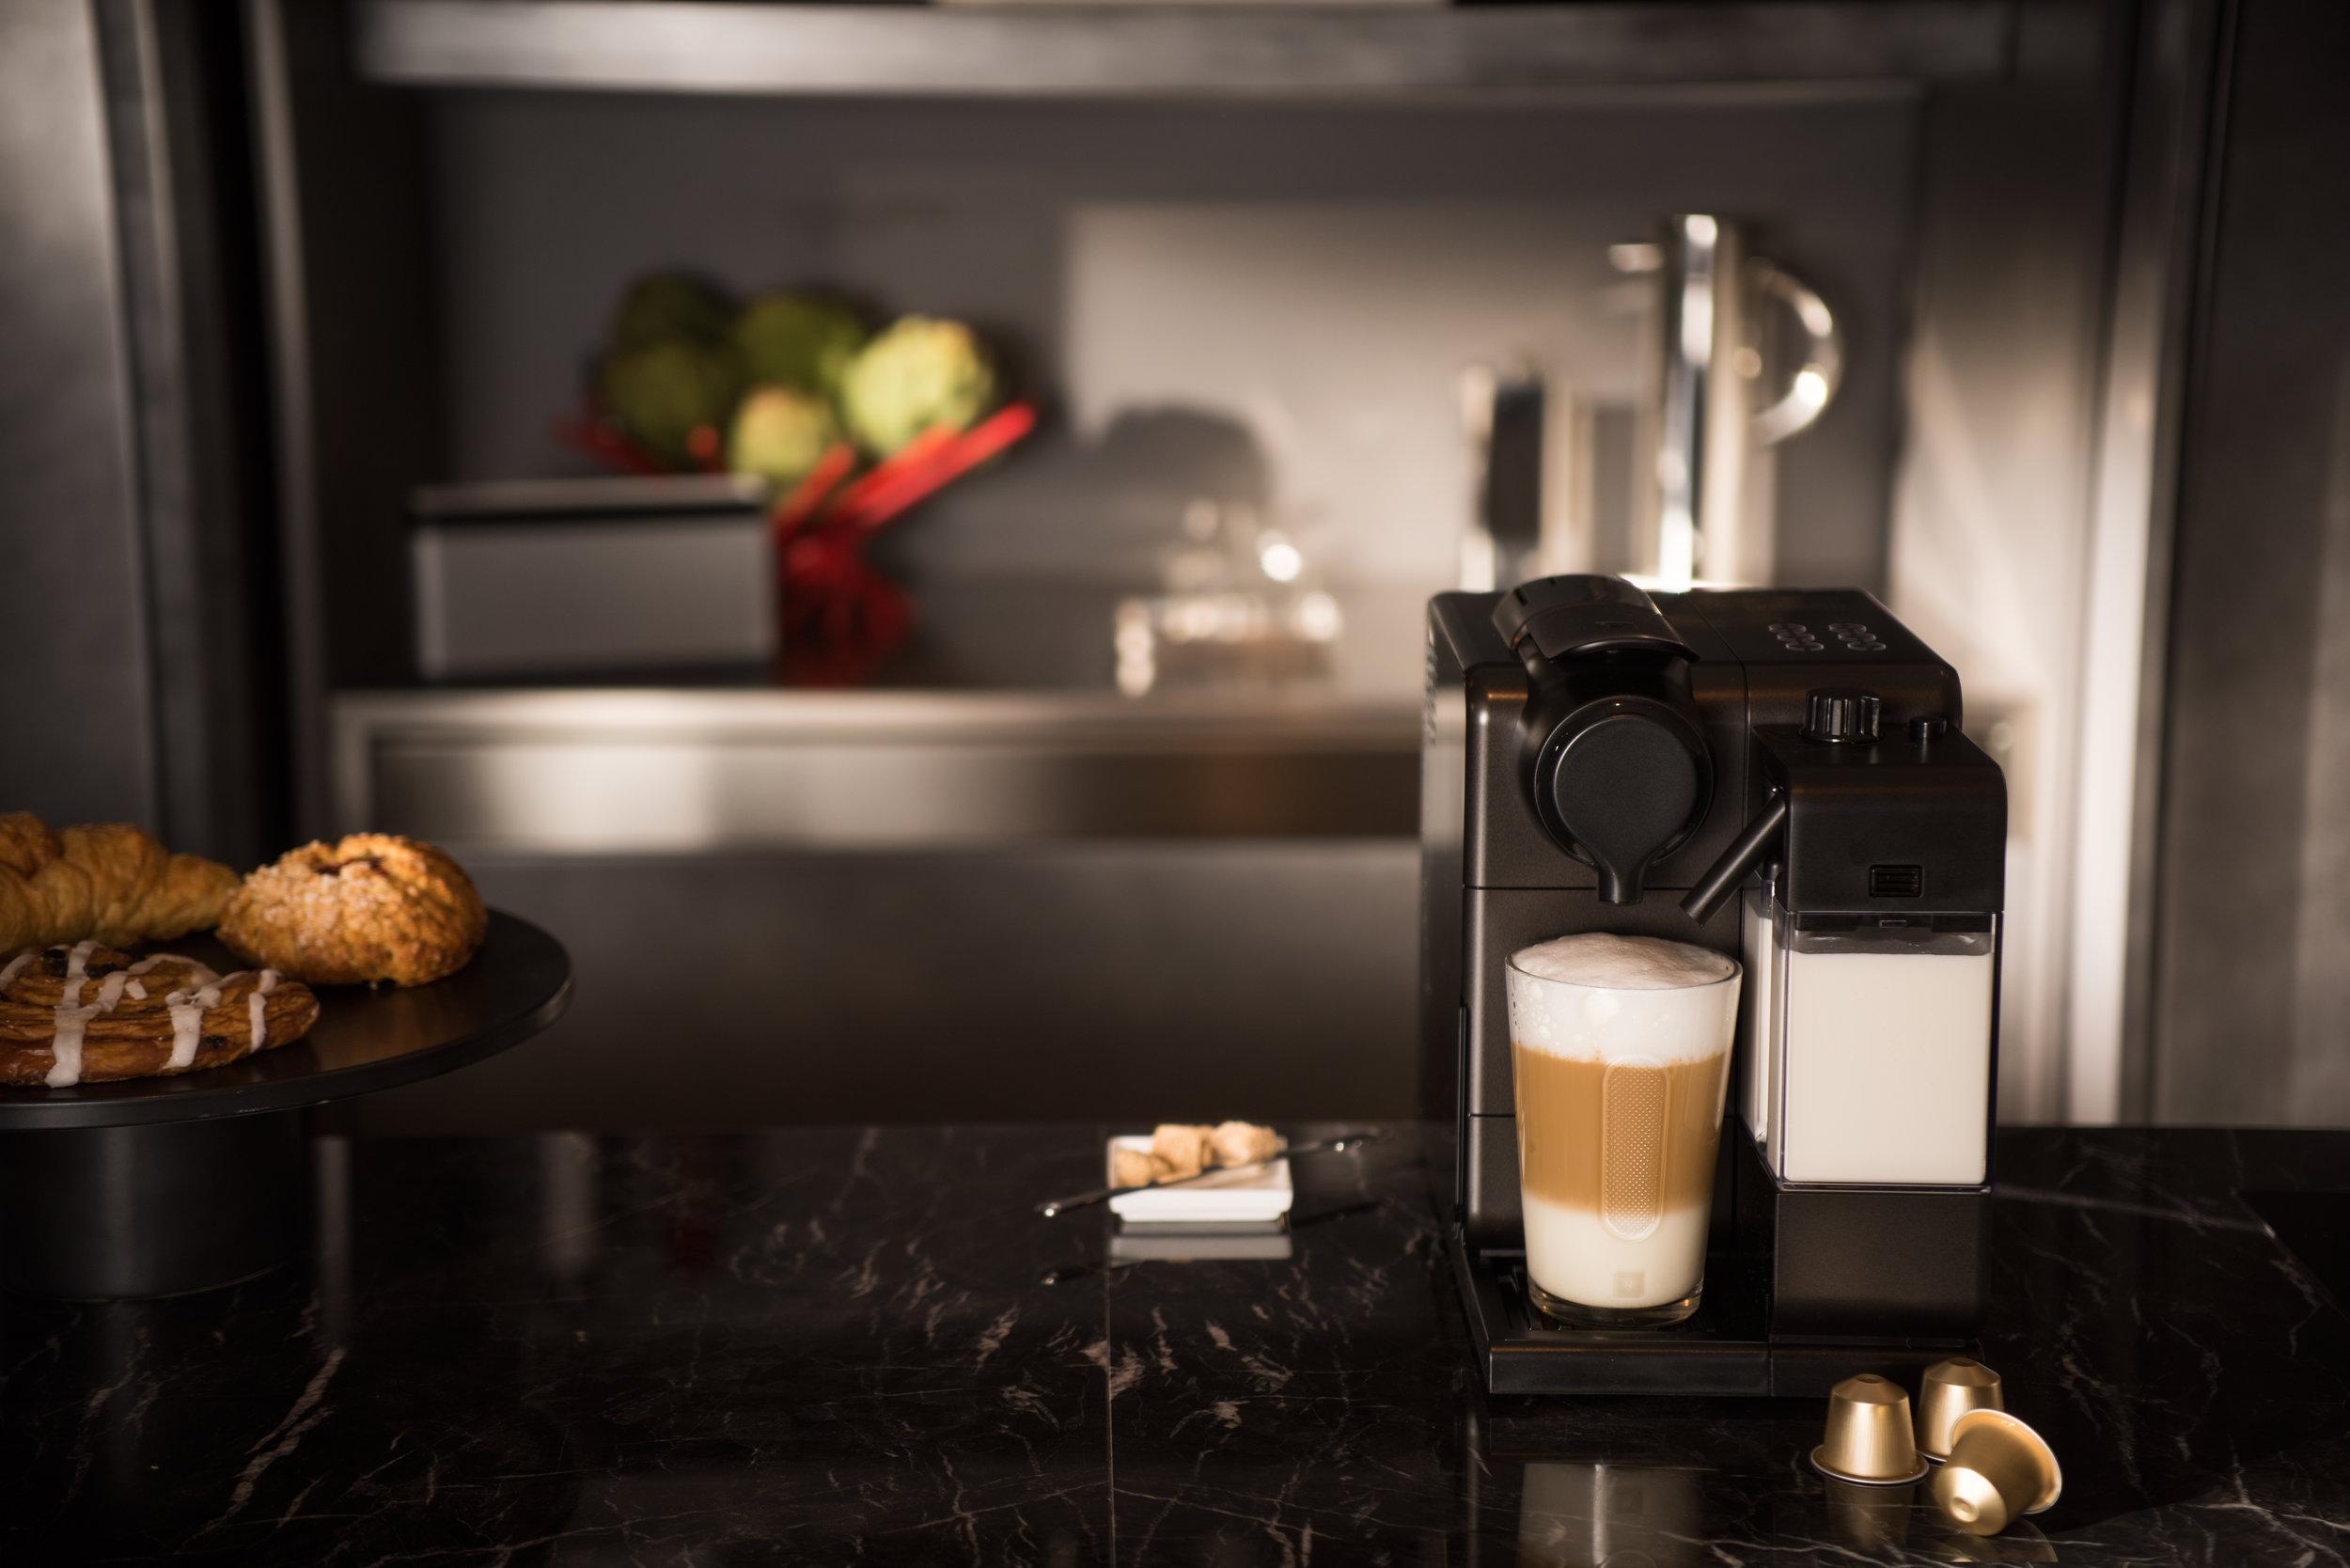 nespresso-kitchenshoot-latissimatouch.jpg